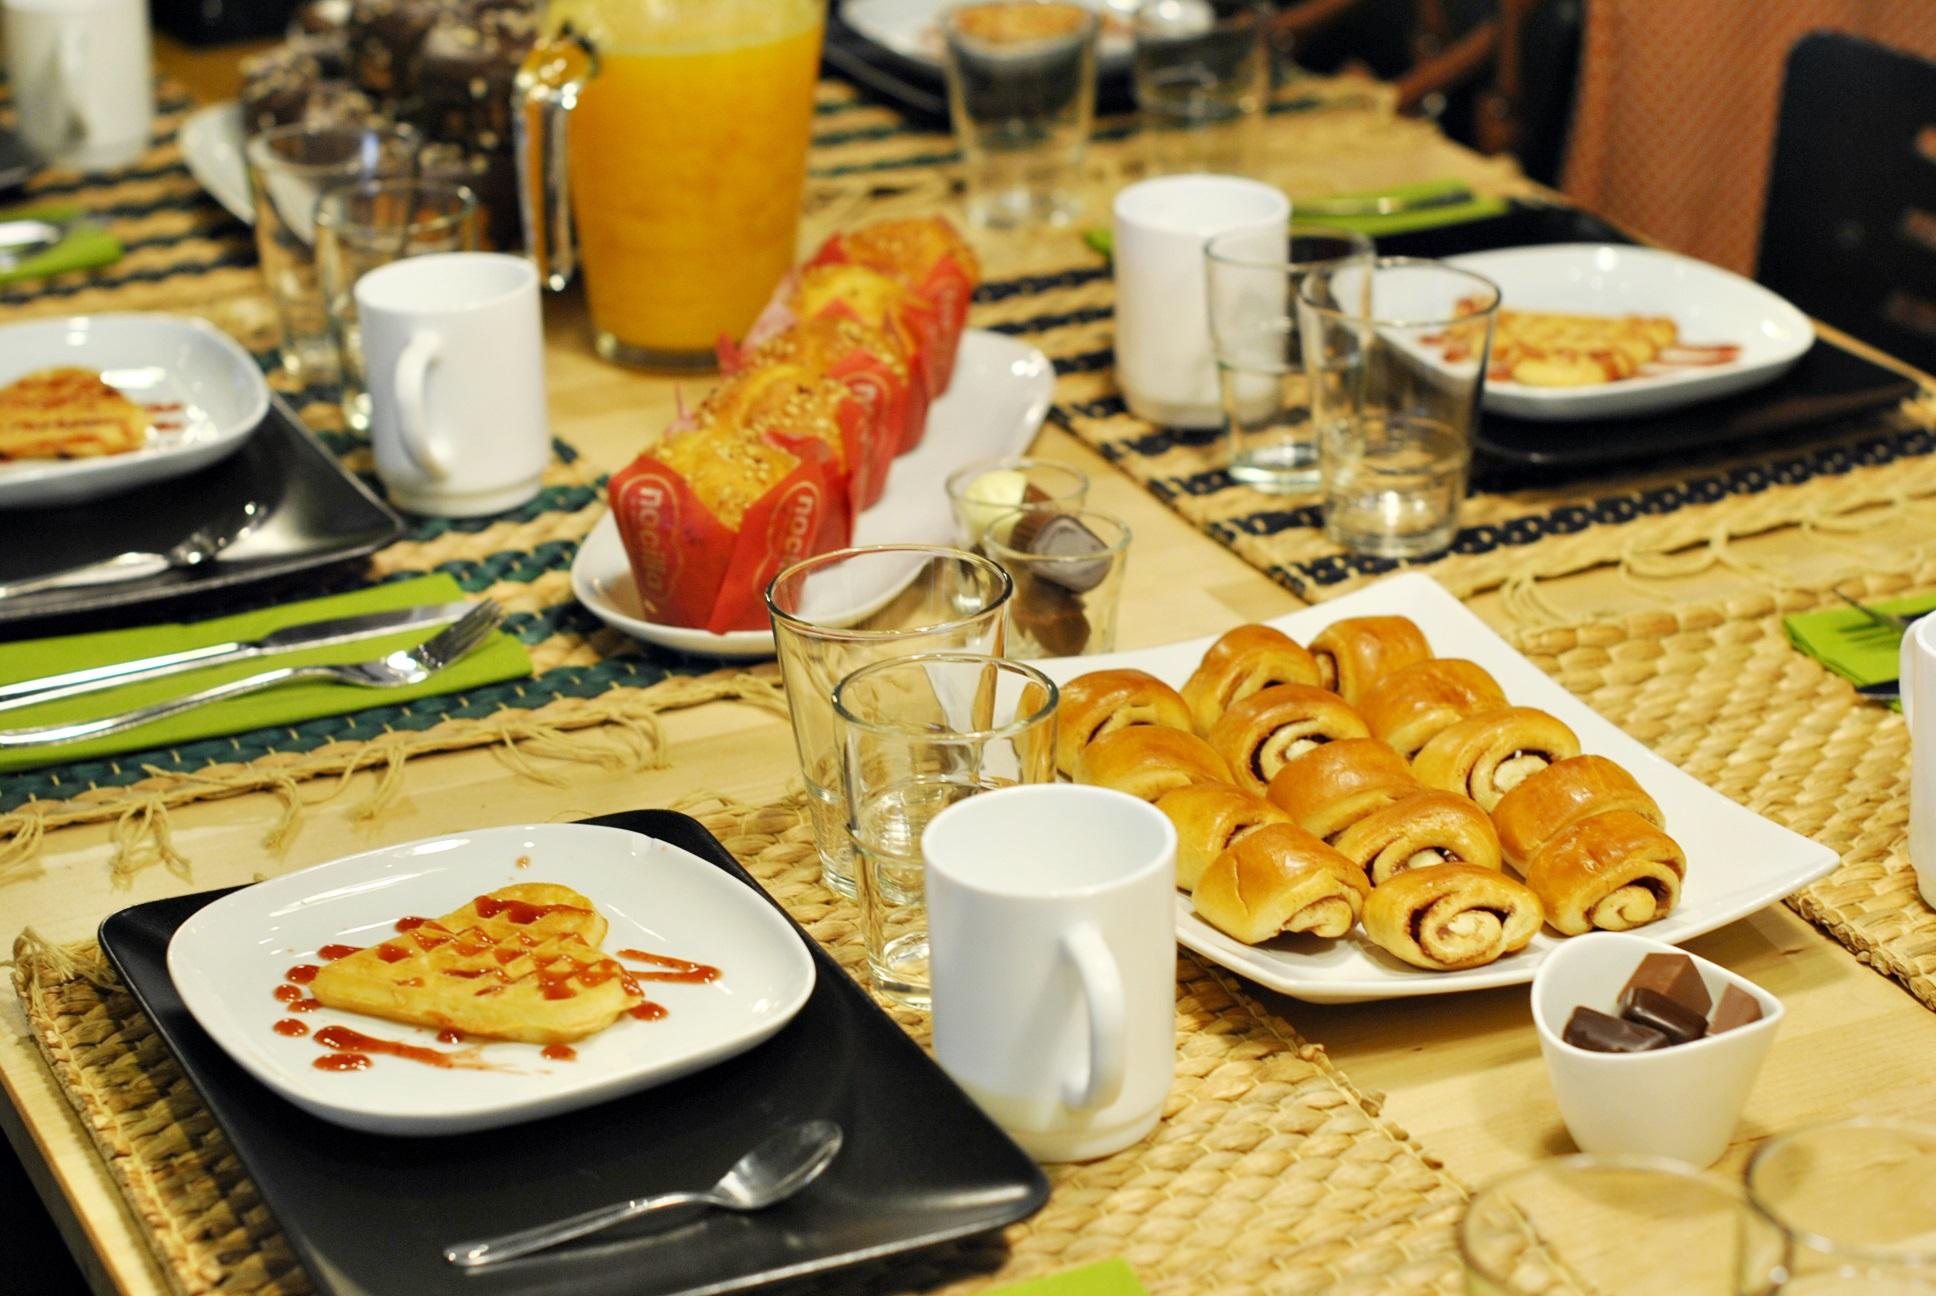 desayuno-blogger-ikea-01